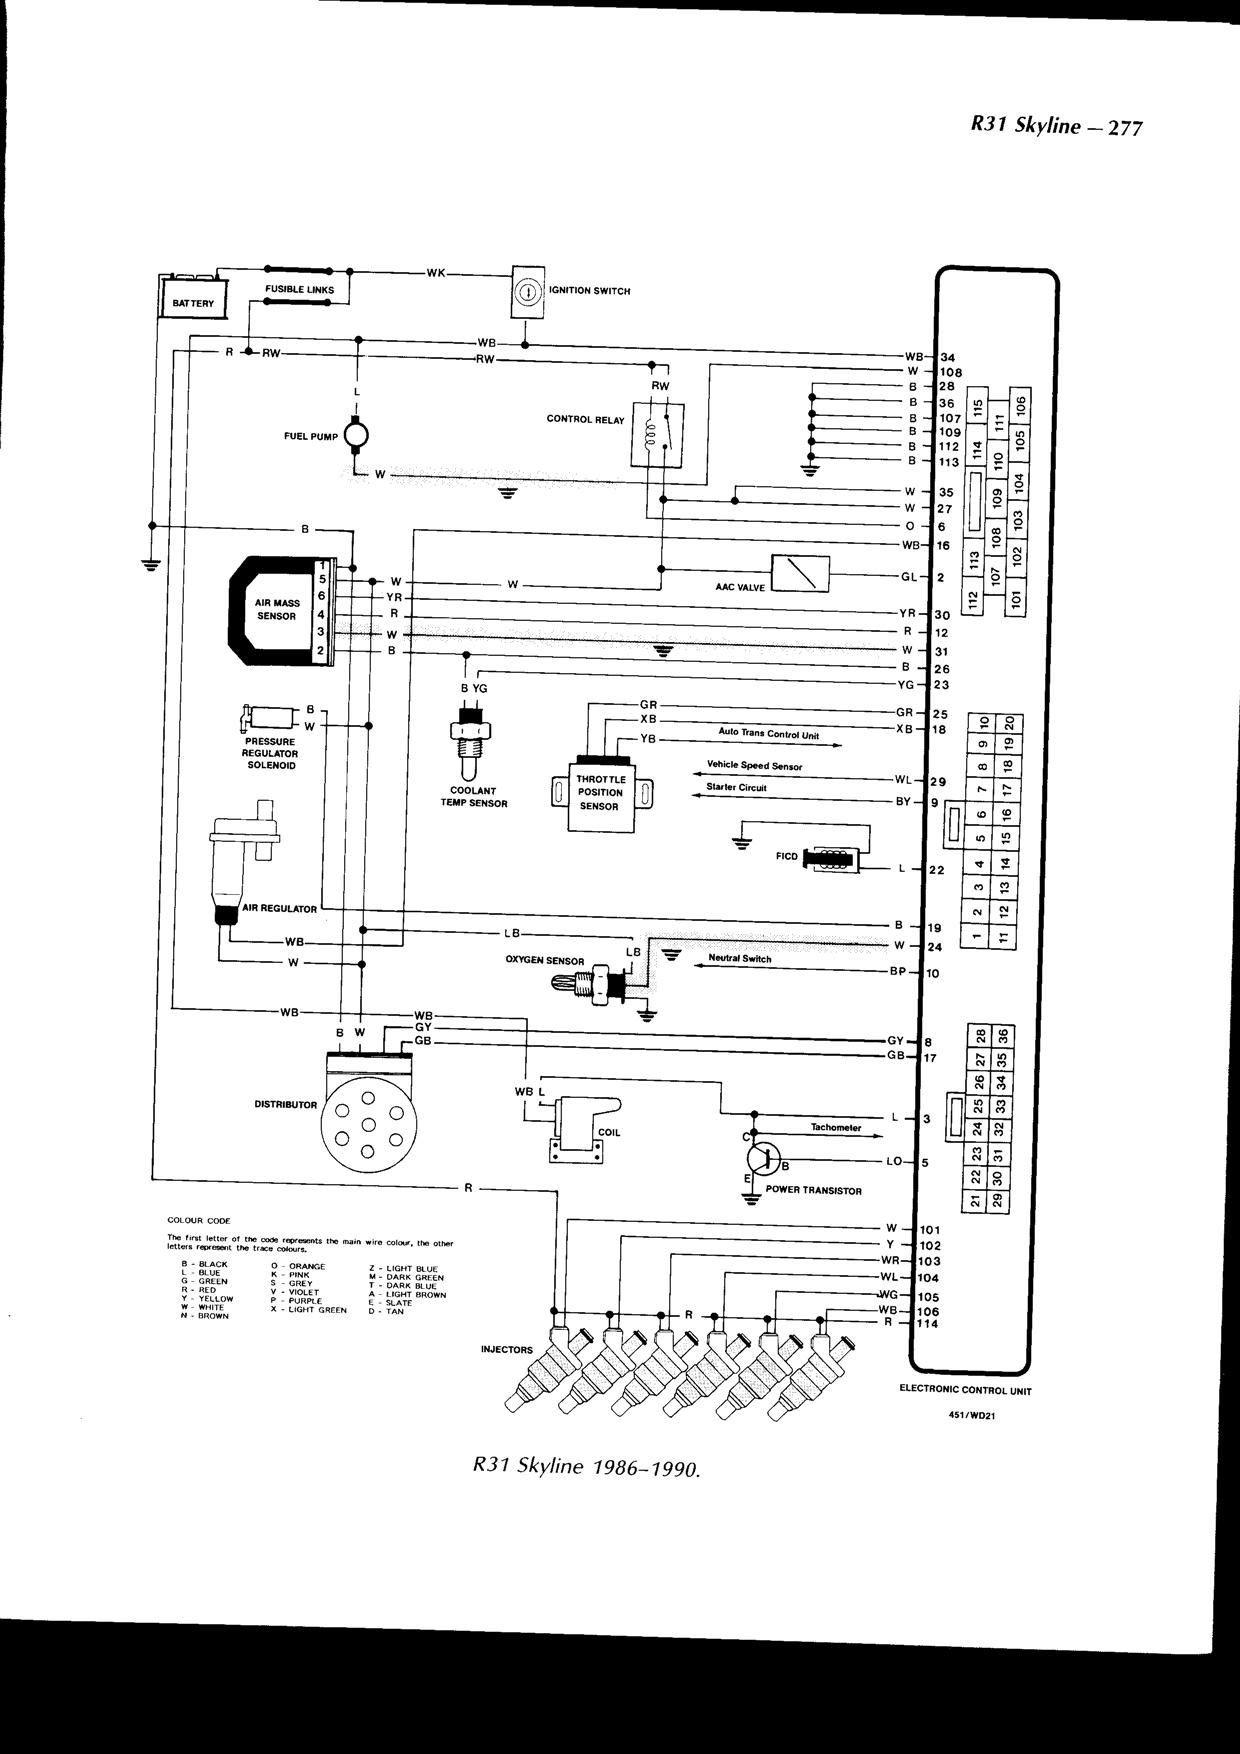 Wiring Push button Start On 1400 Datsun 79dff Nissan 1400 Bakkie Wiring Diagram Of Wiring Push button Start On 1400 Datsun